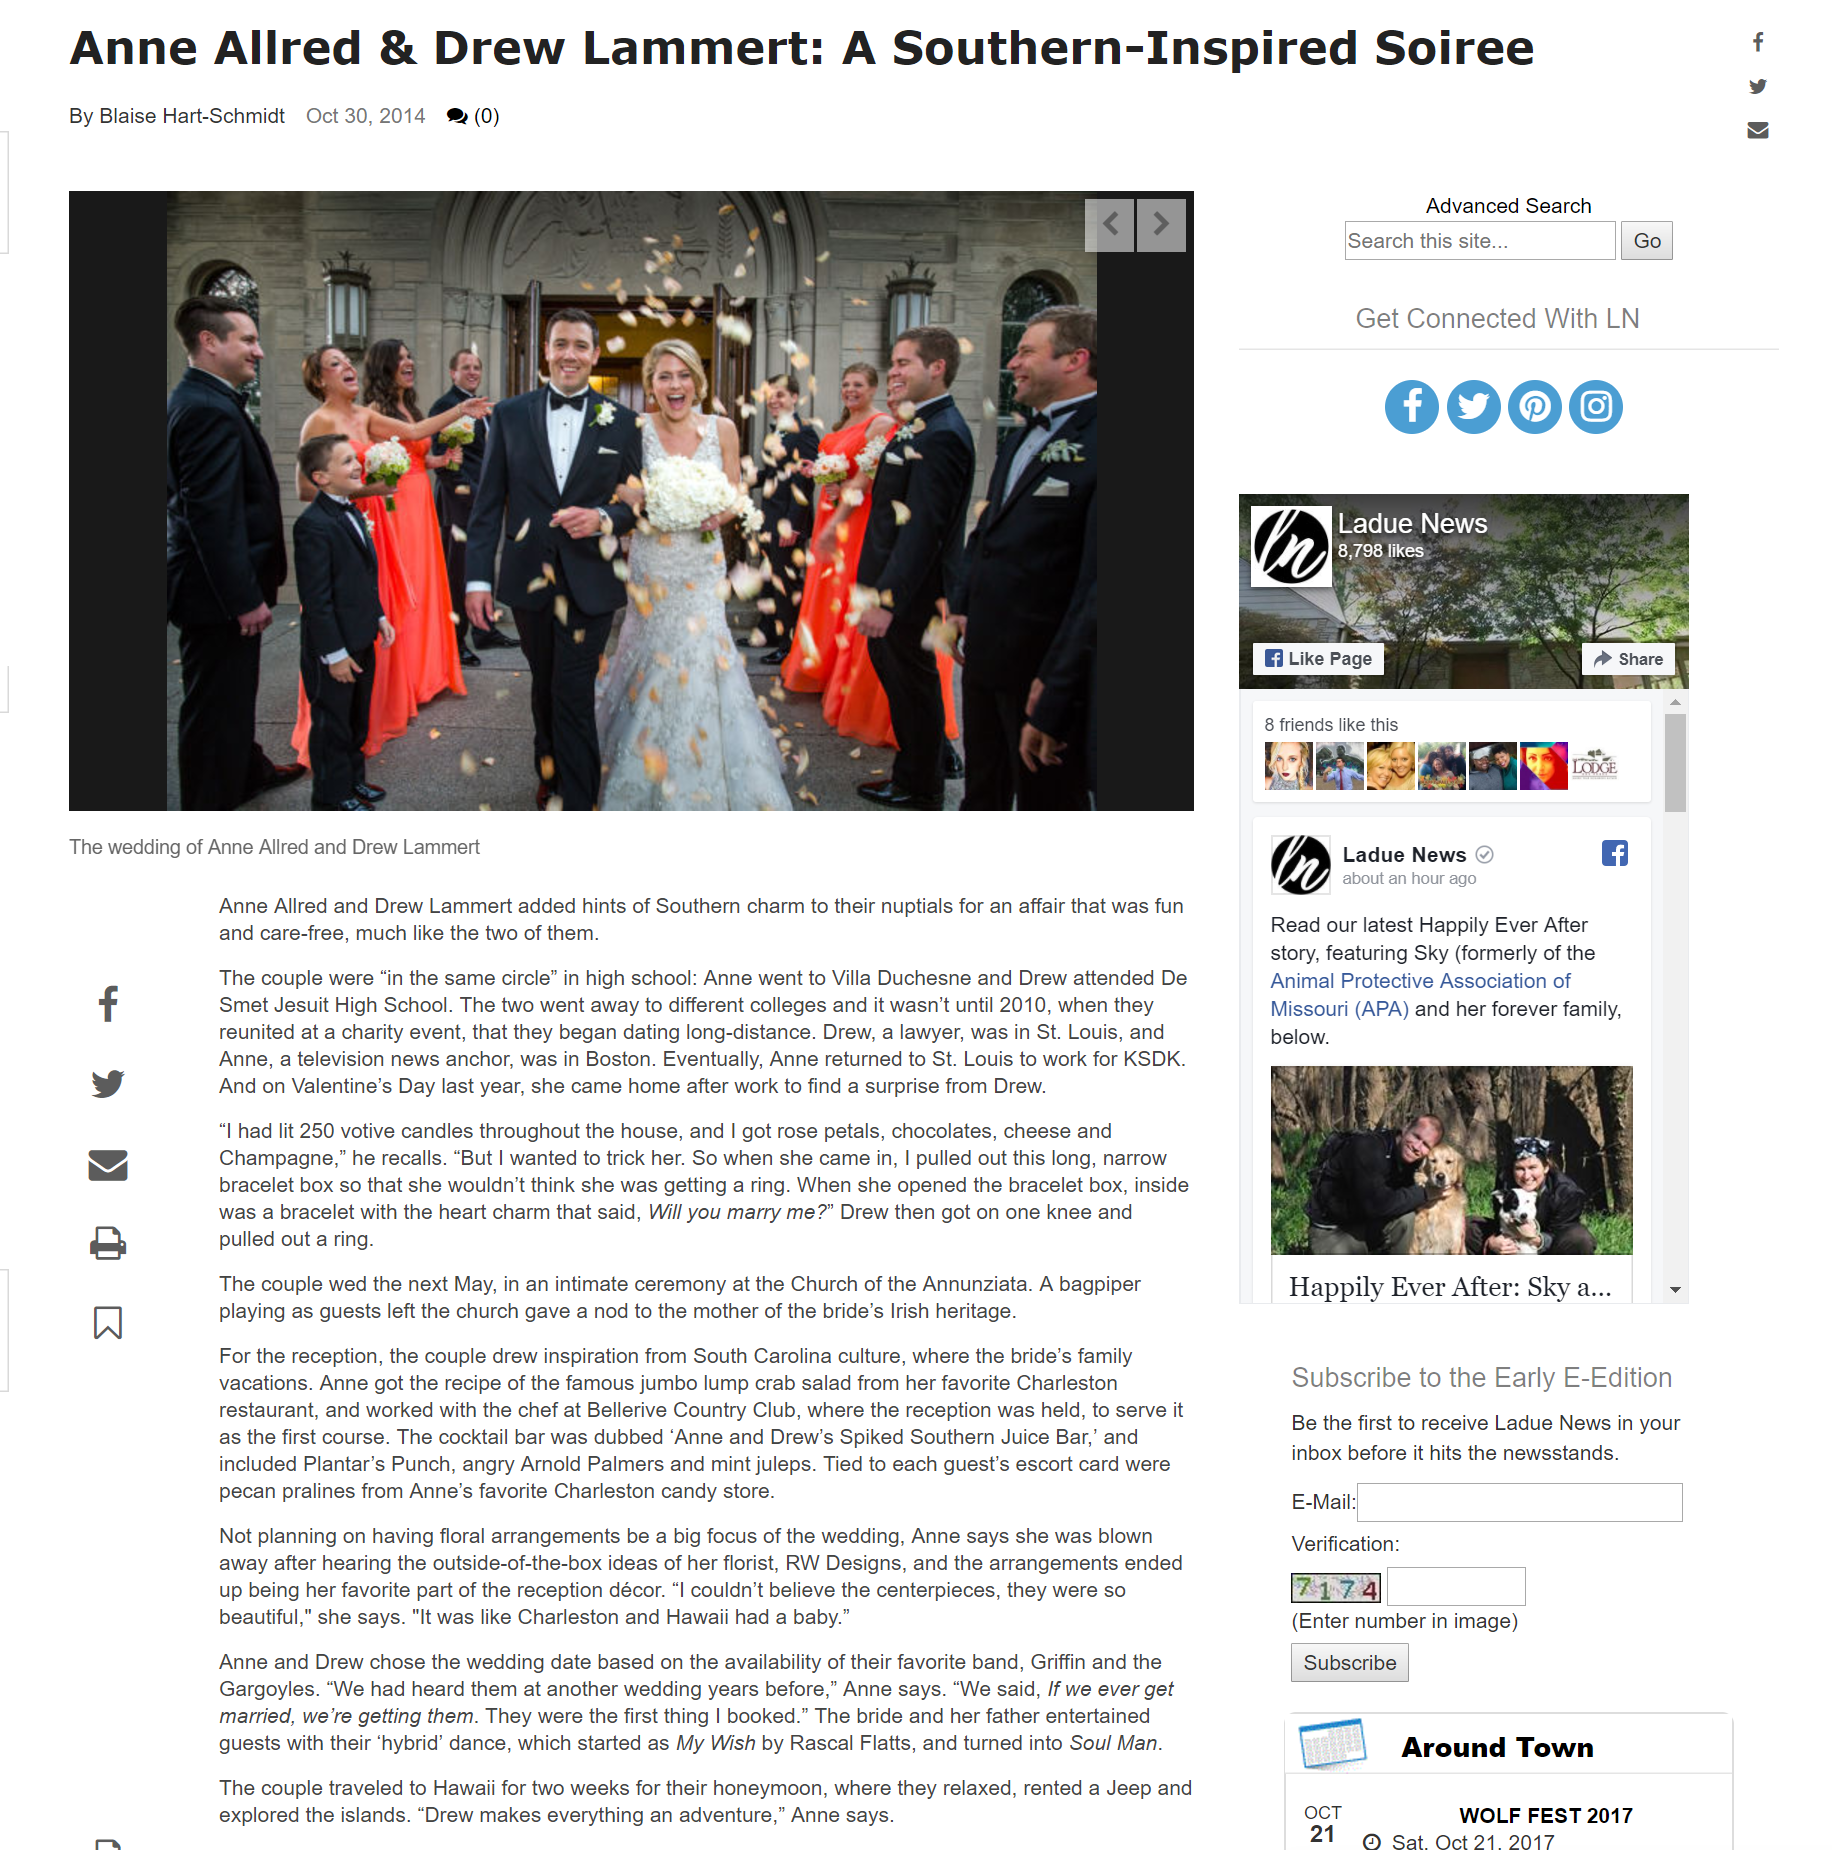 screencapture-laduenews-elegant-living-weddings-anne-allred-drew-lammert-a-southern-inspired-soiree-article_324a05b1-2a7e-527e-9dbf-3c0c1918a6bd-html-1508514767469USETHIS2.png